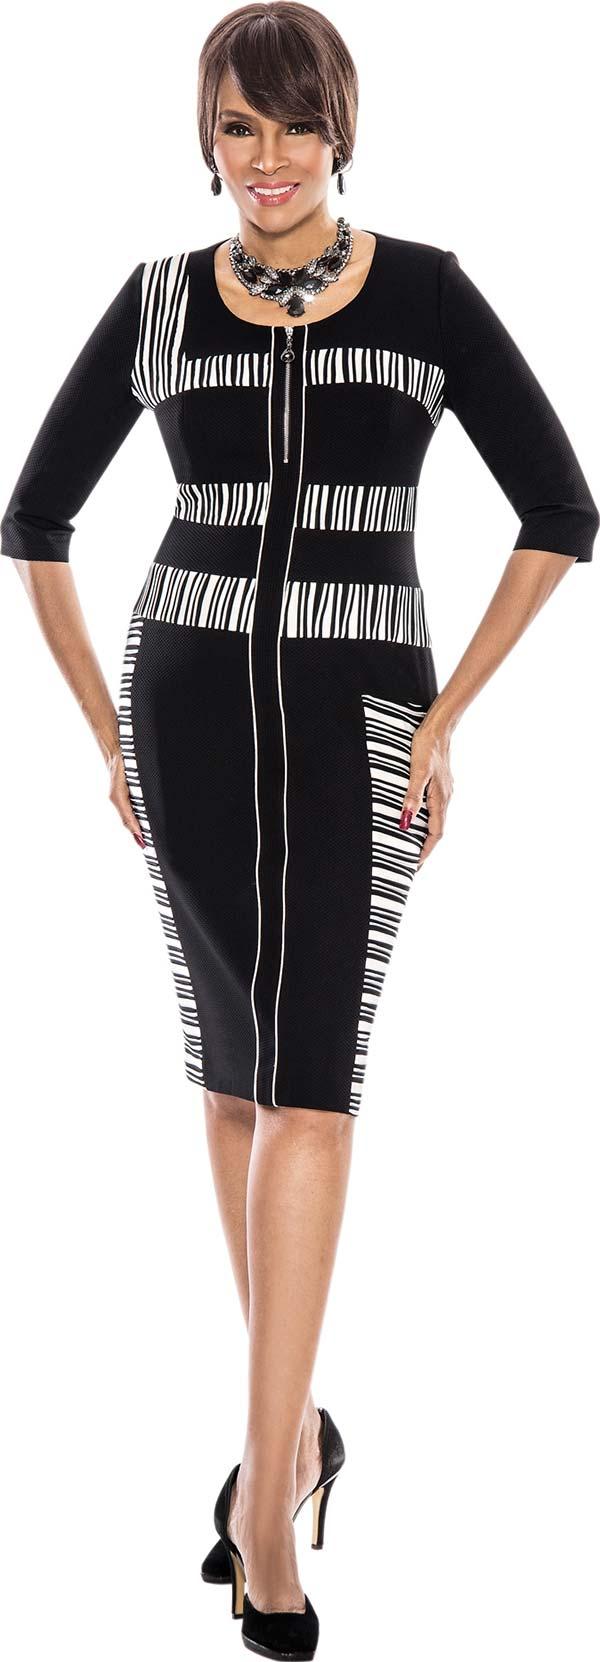 Terramina 7536-Black - Three Quarter Sleeve Ladies Dress With Striped Inset Design